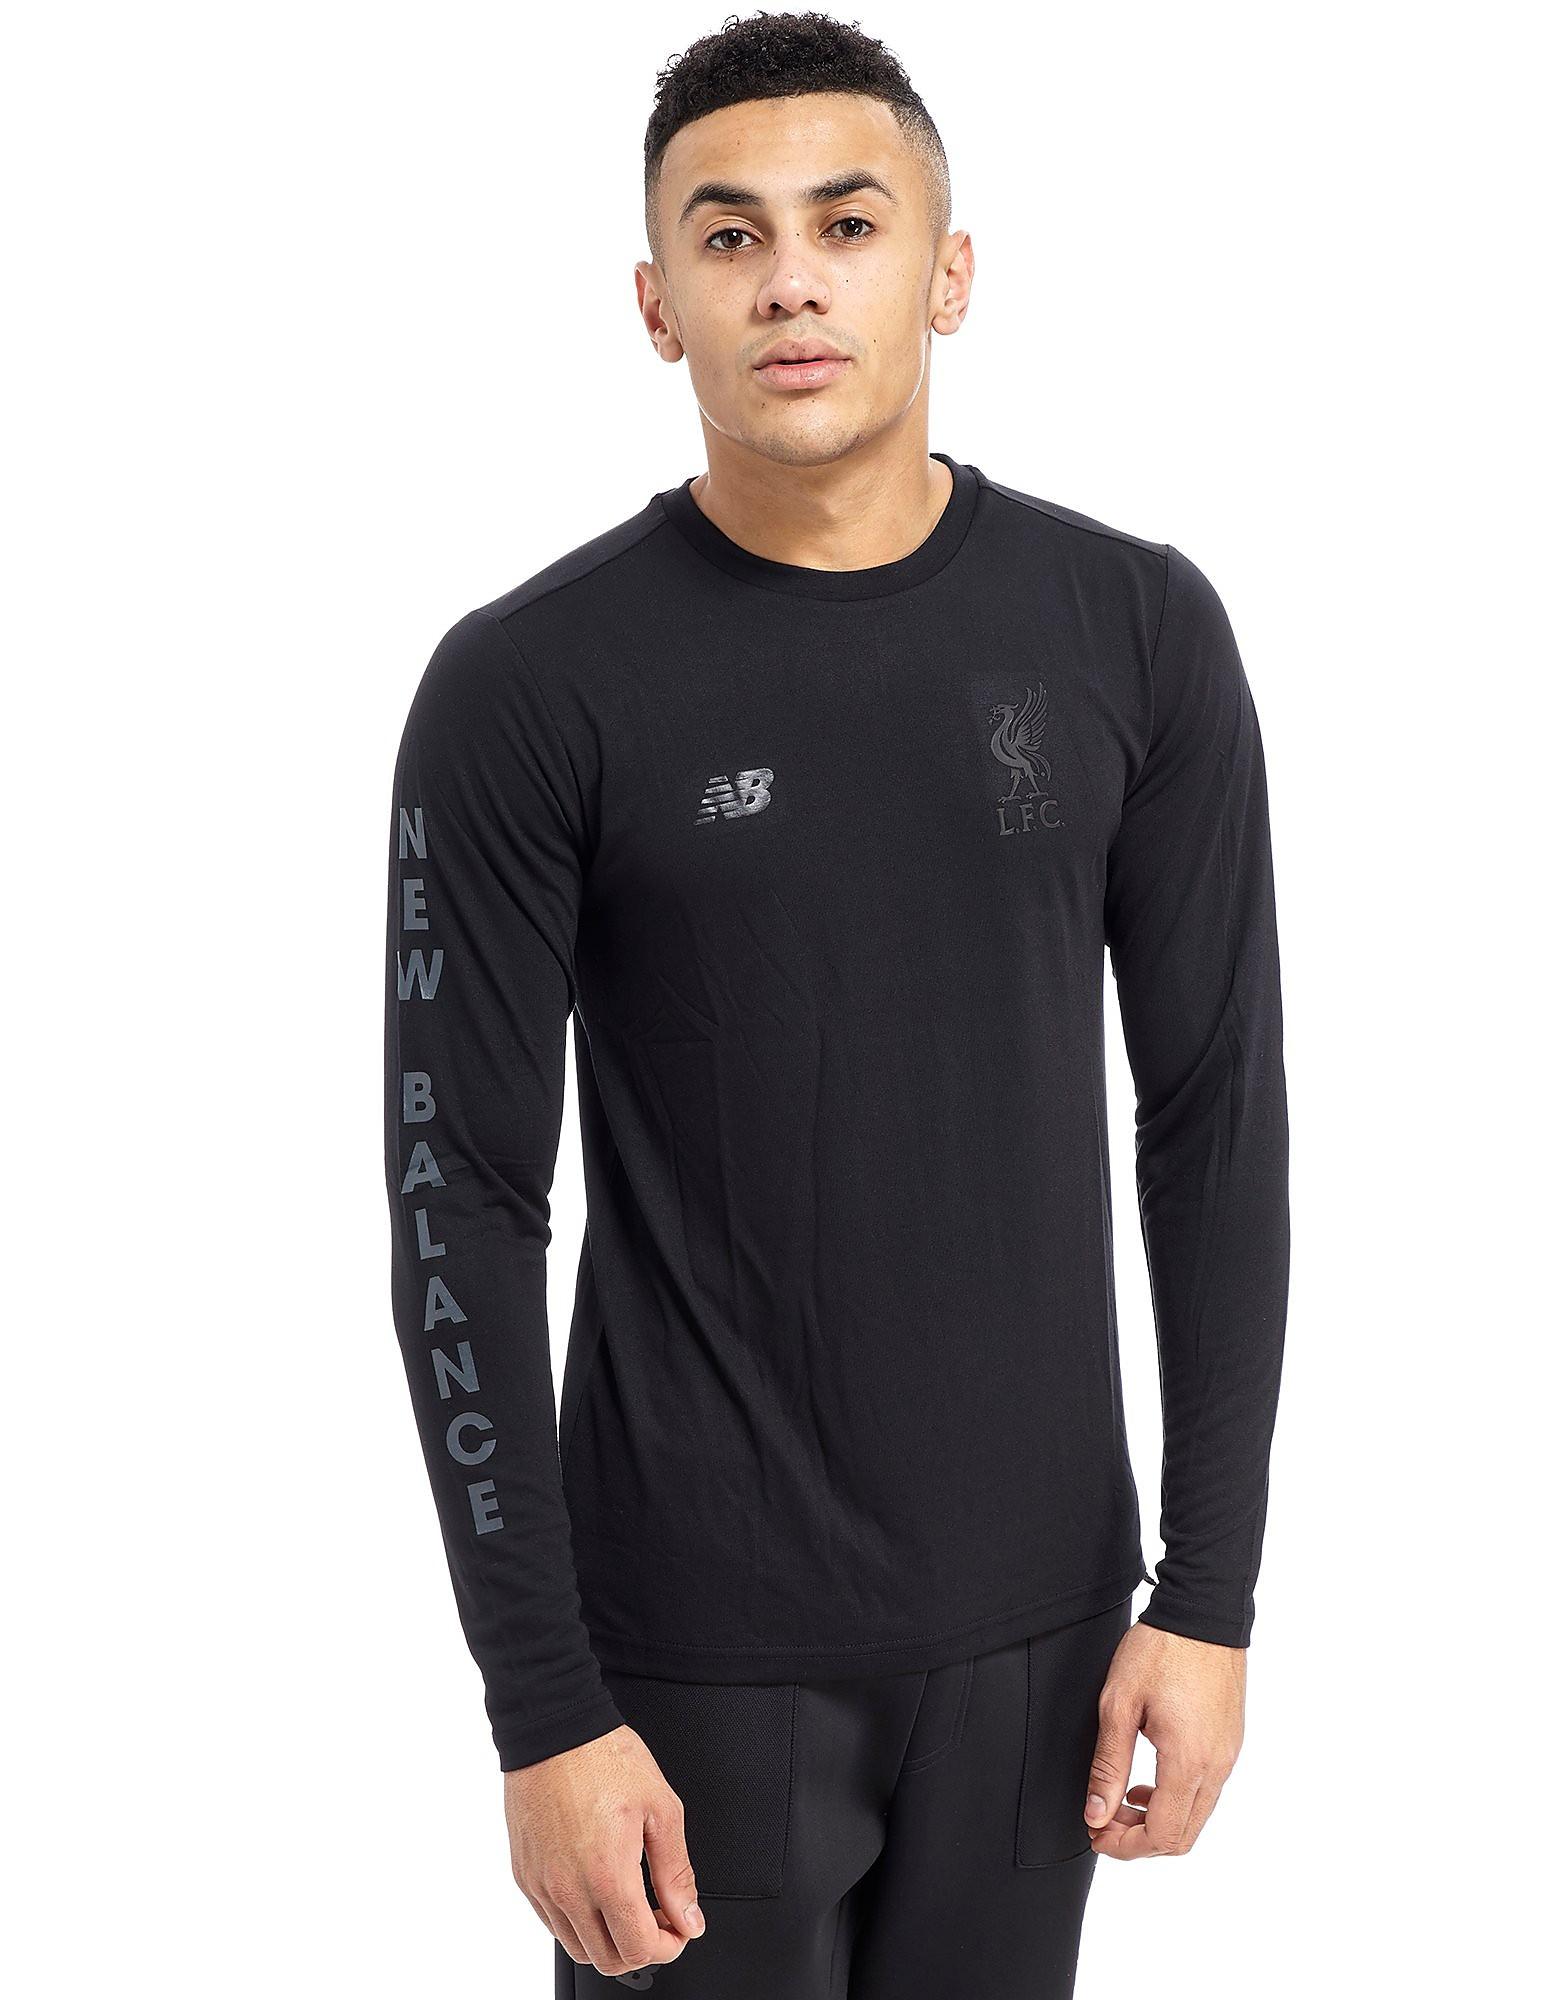 New Balance 247 Liverpool FC T-Shirt Homme